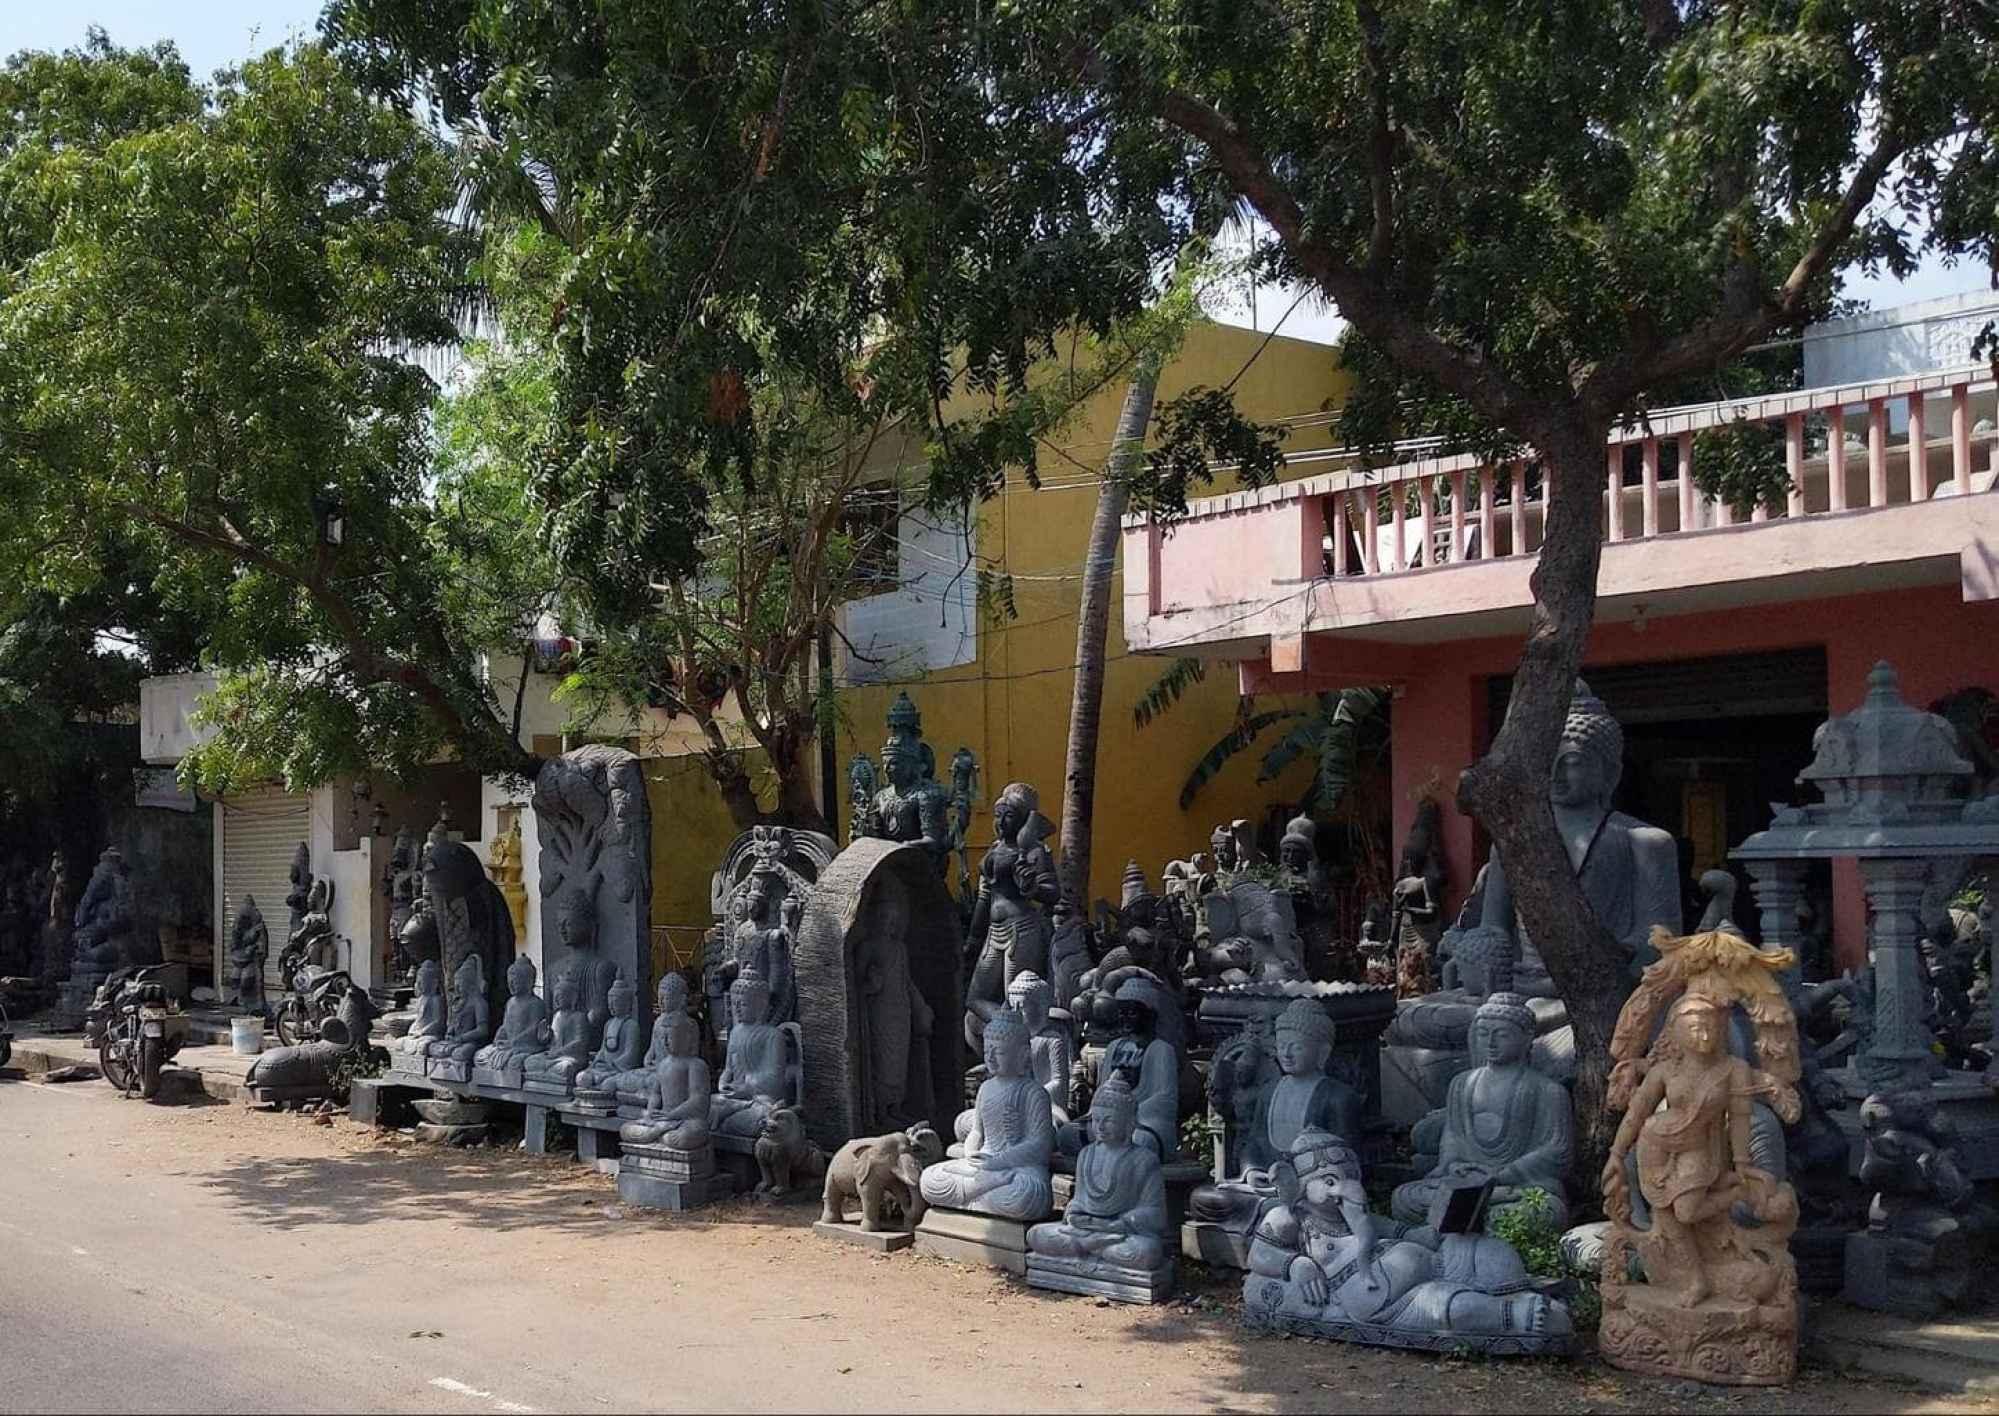 Ganga Arts